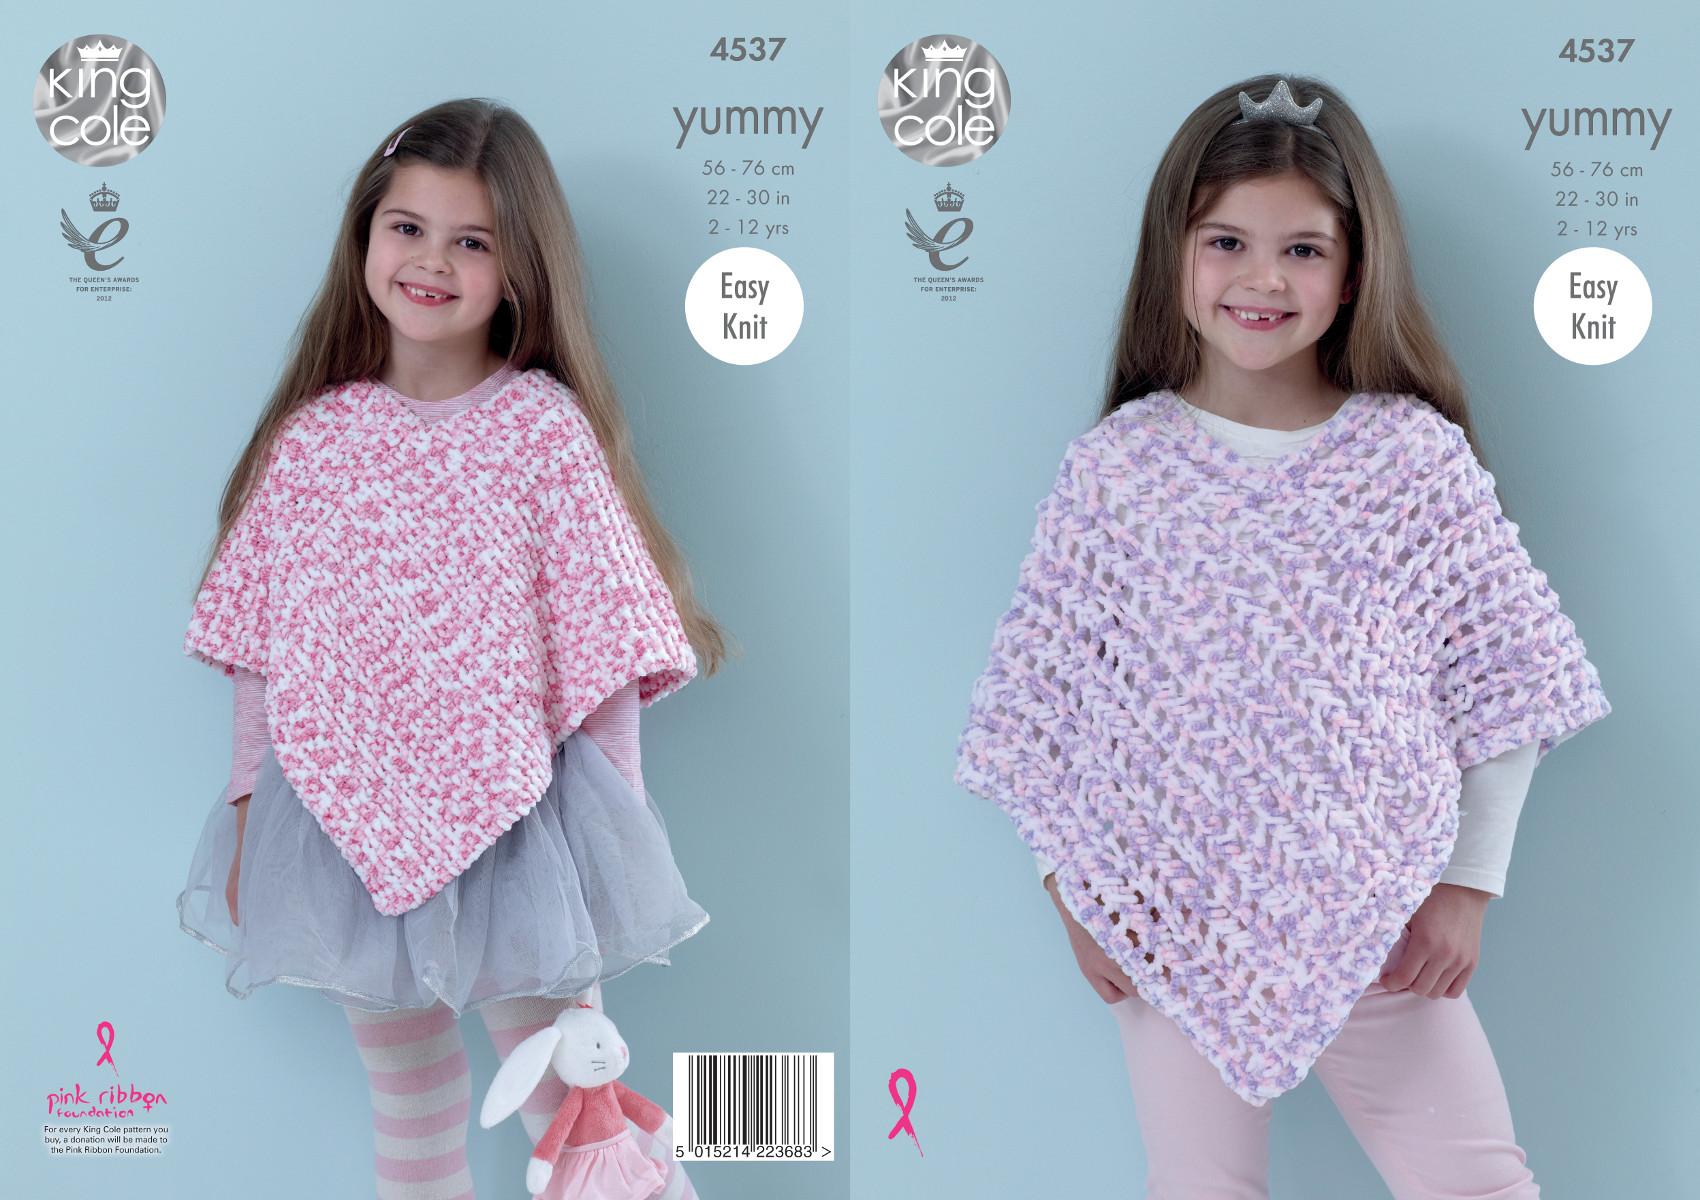 King Cole Girls Knitting Pattern Easy Knit Garter Stitch Lace ...